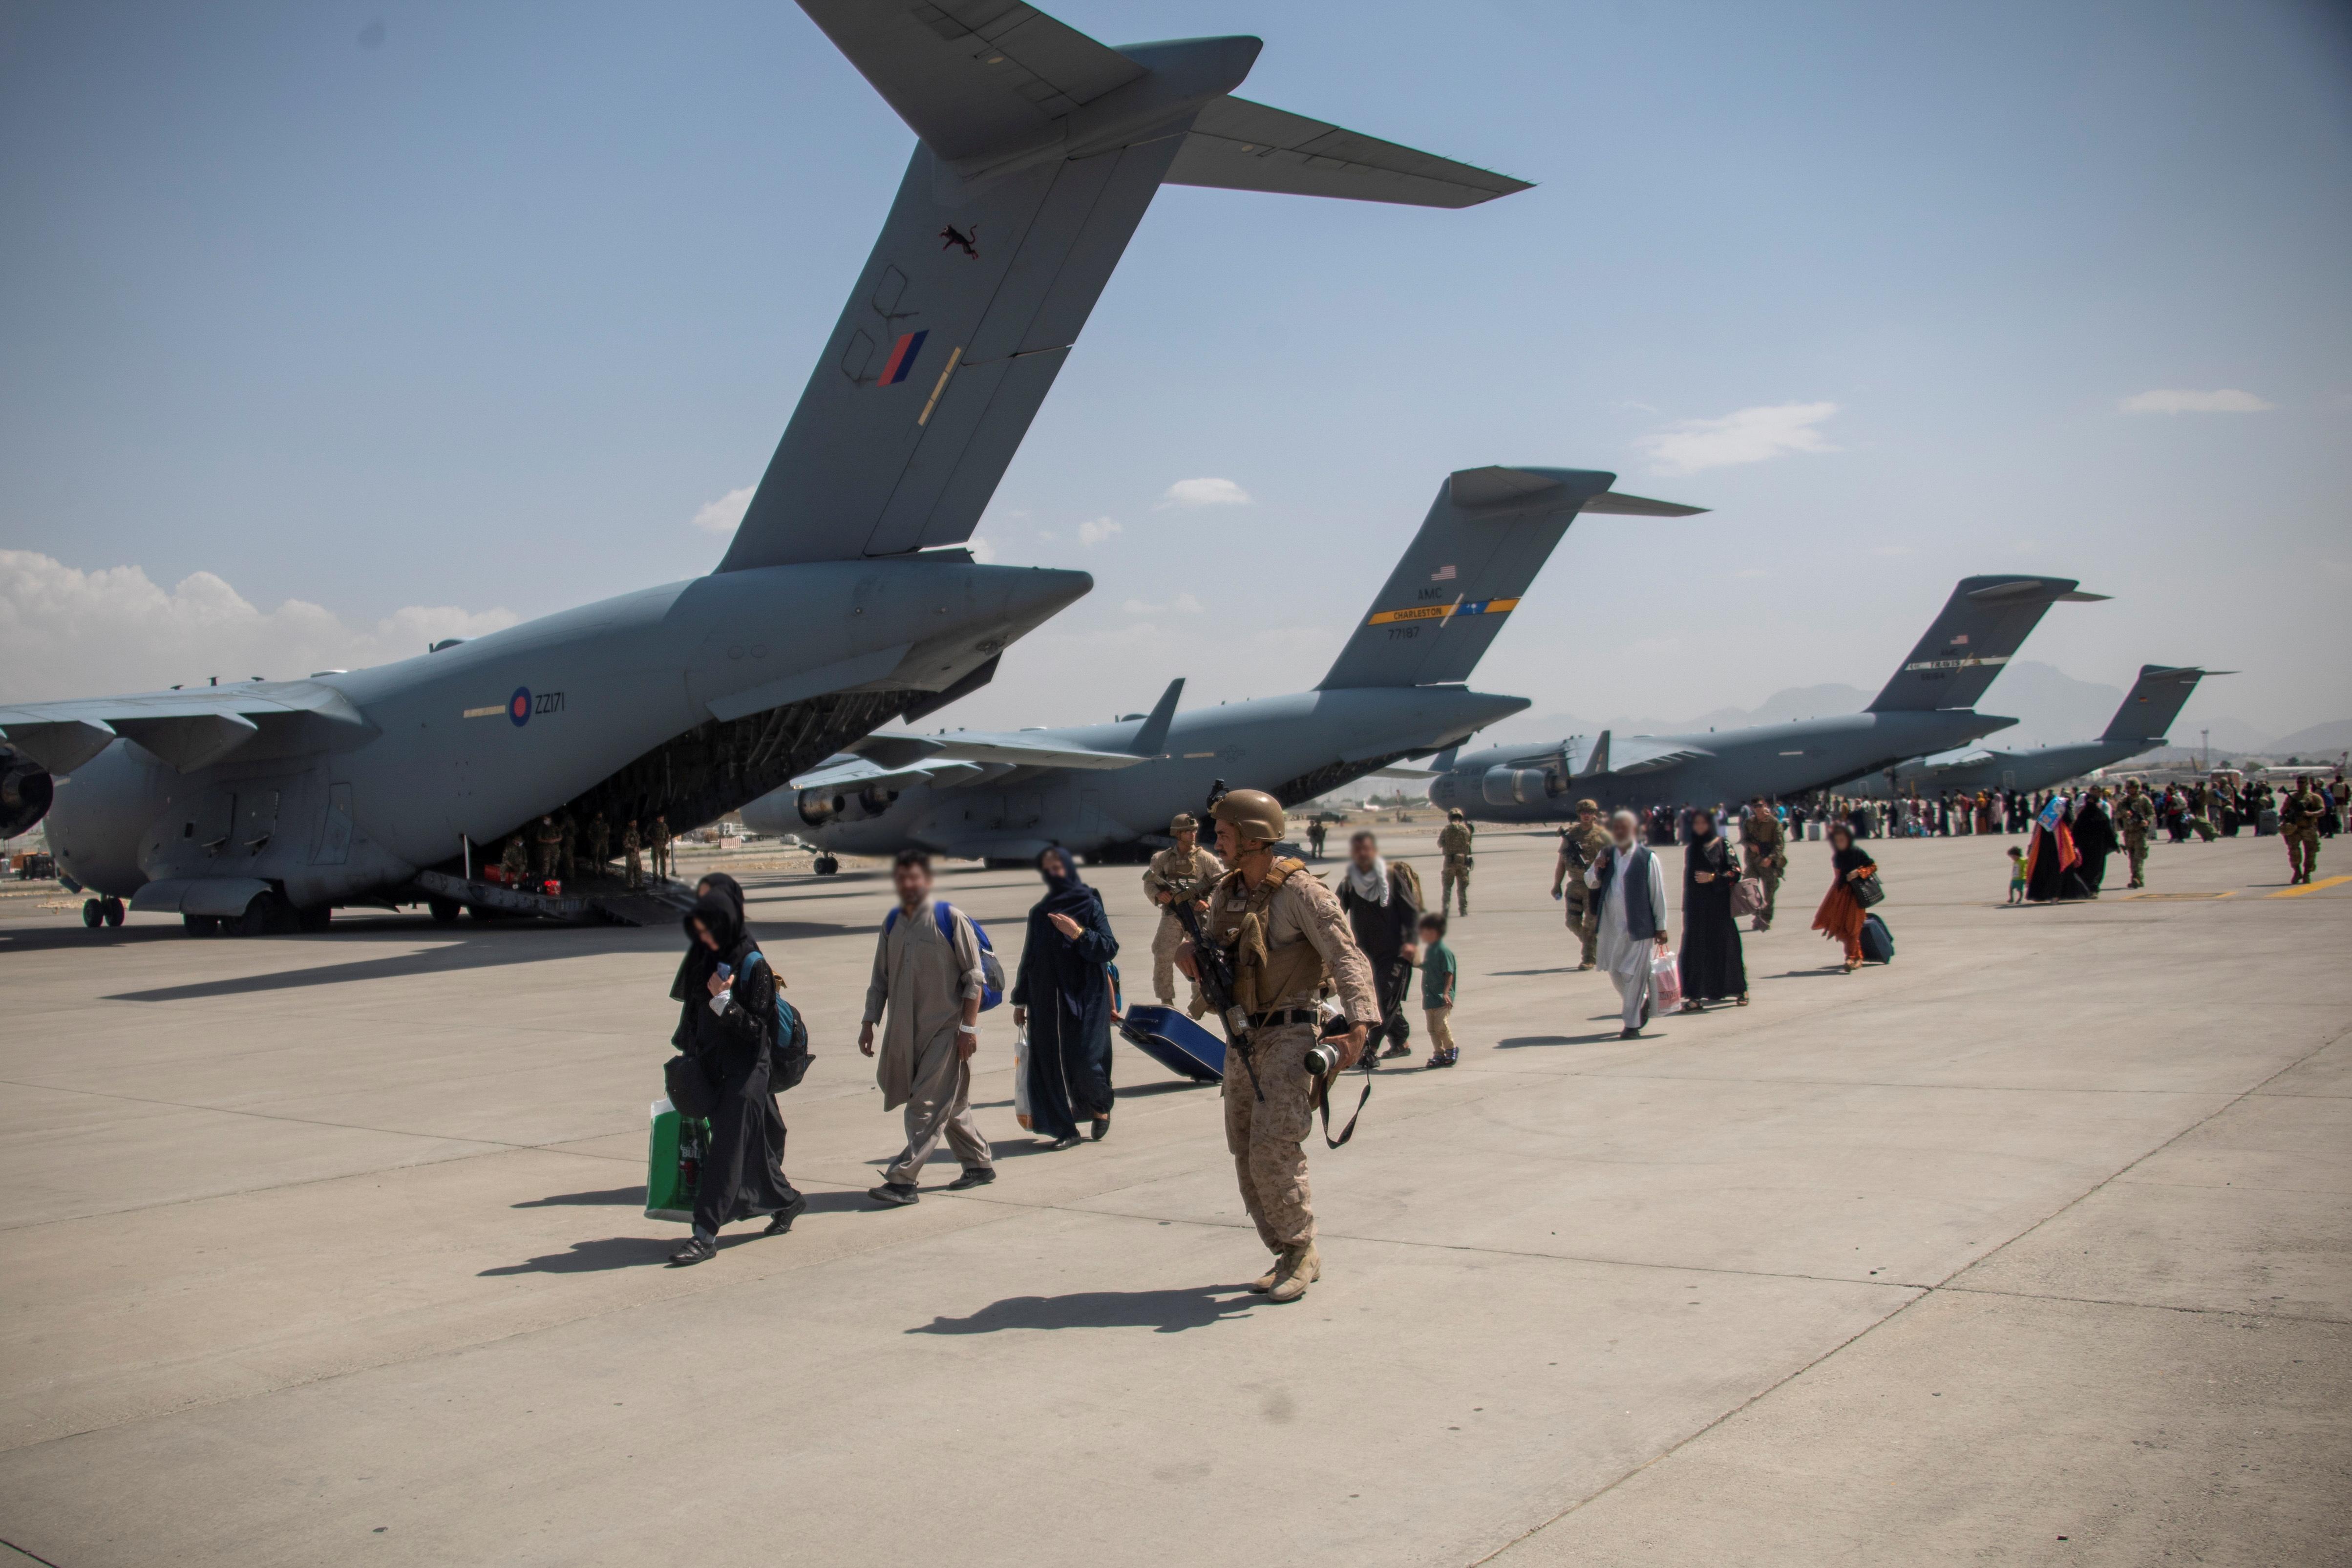 Extension to evacuation window in Afghanistan unlikely, UK warns